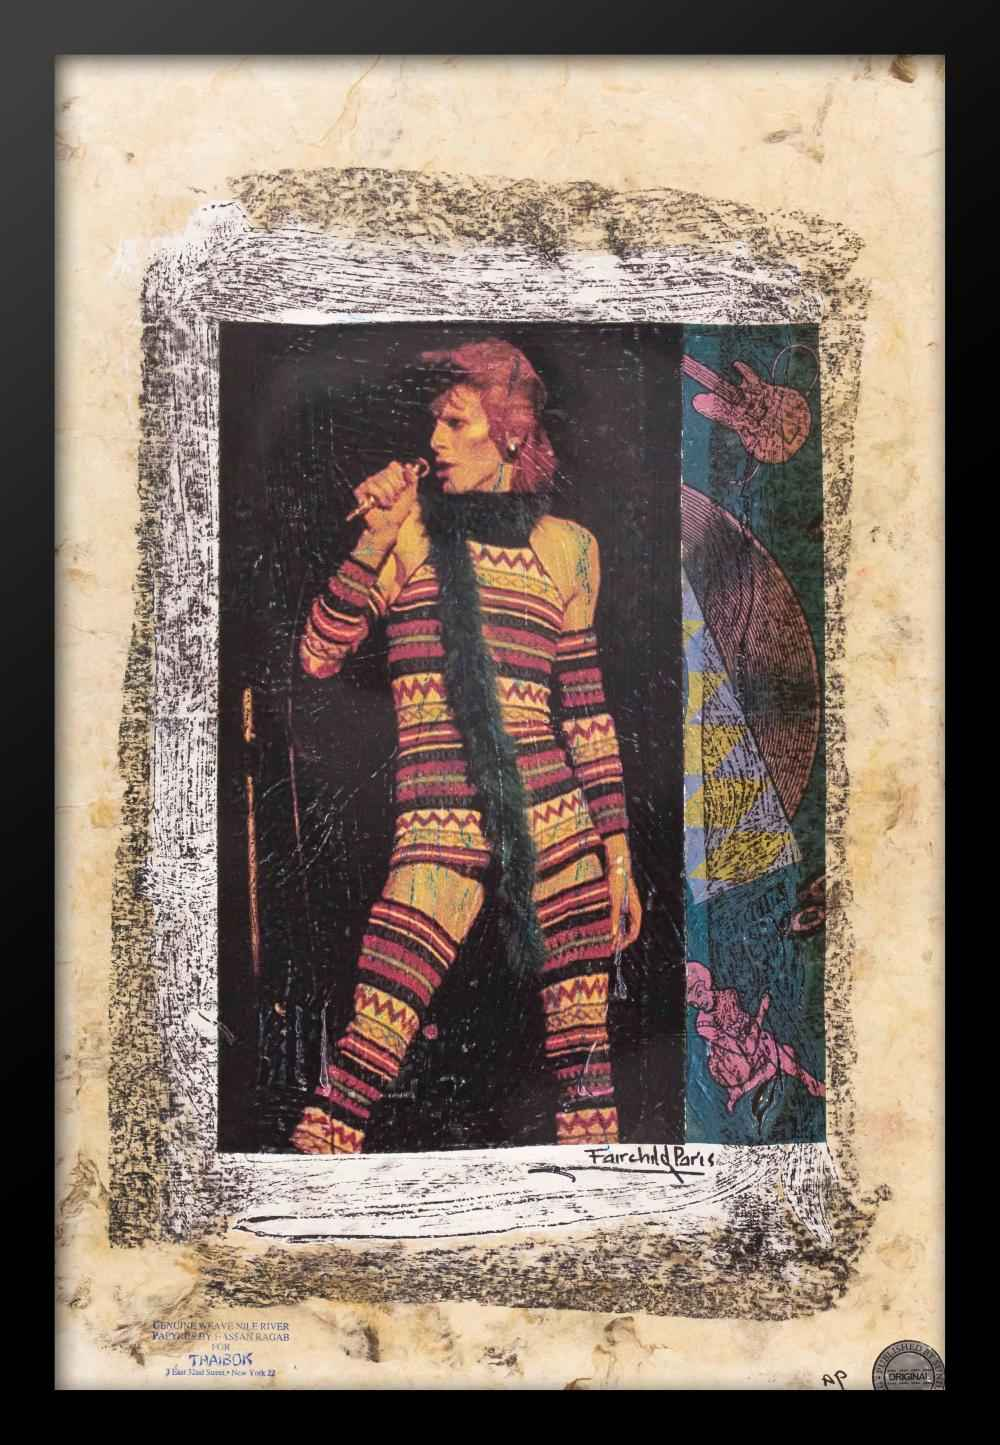 David Bowie as Ziggy ... by  Fairchild Paris - Masterpiece Online